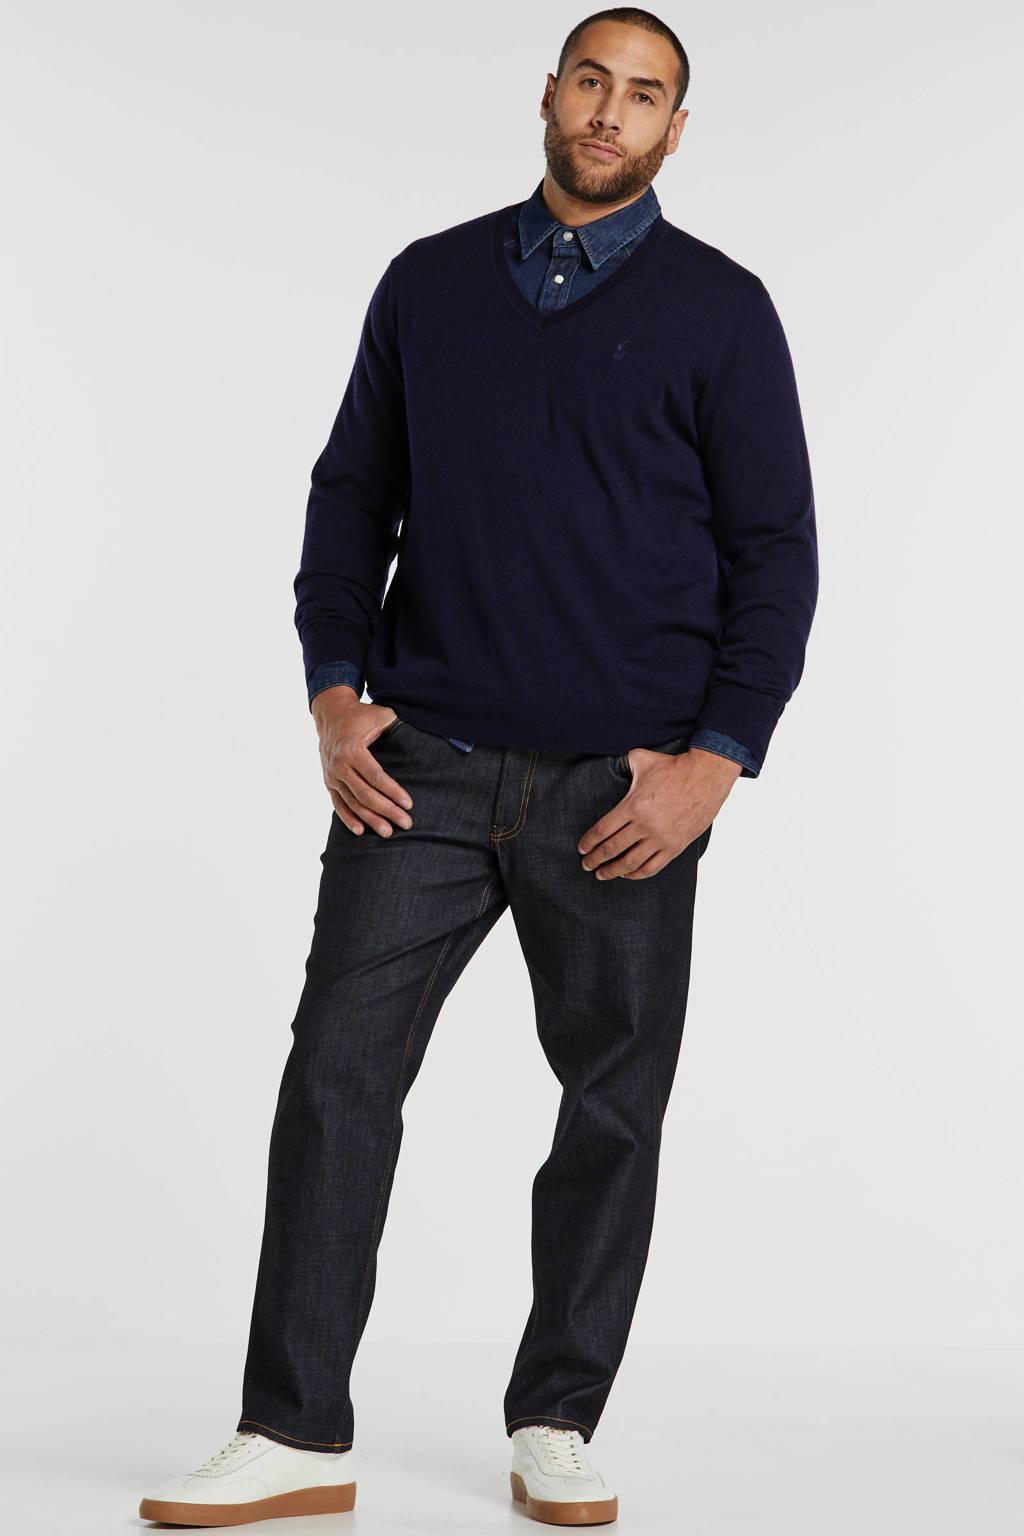 POLO Ralph Lauren Big & Tall +size wollen trui donkerblauw, Donkerblauw